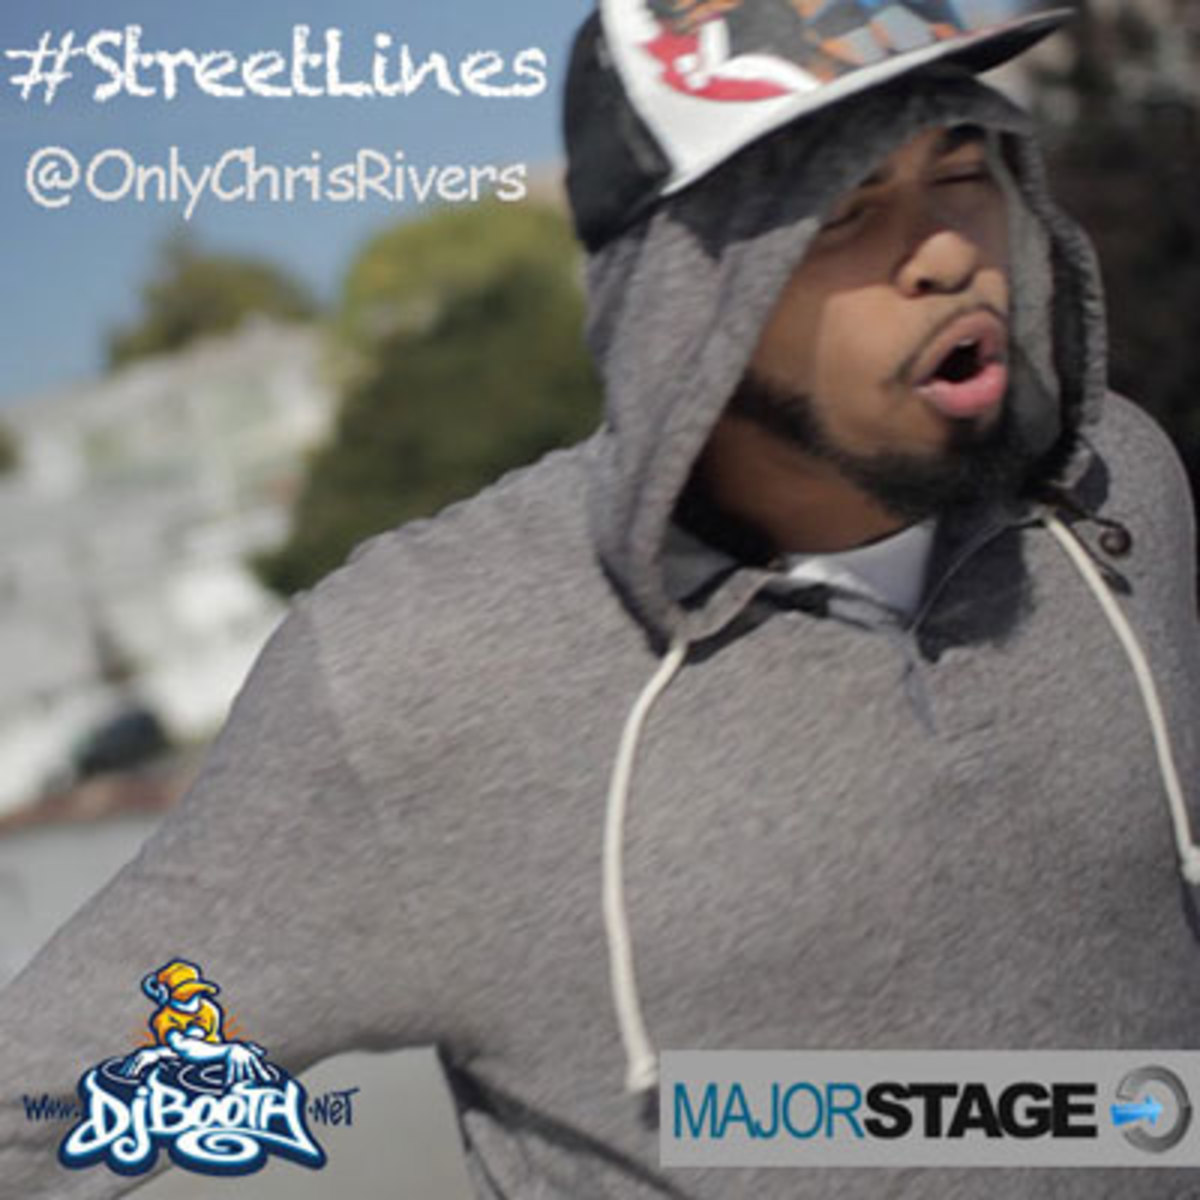 crivers-streetlines.jpg